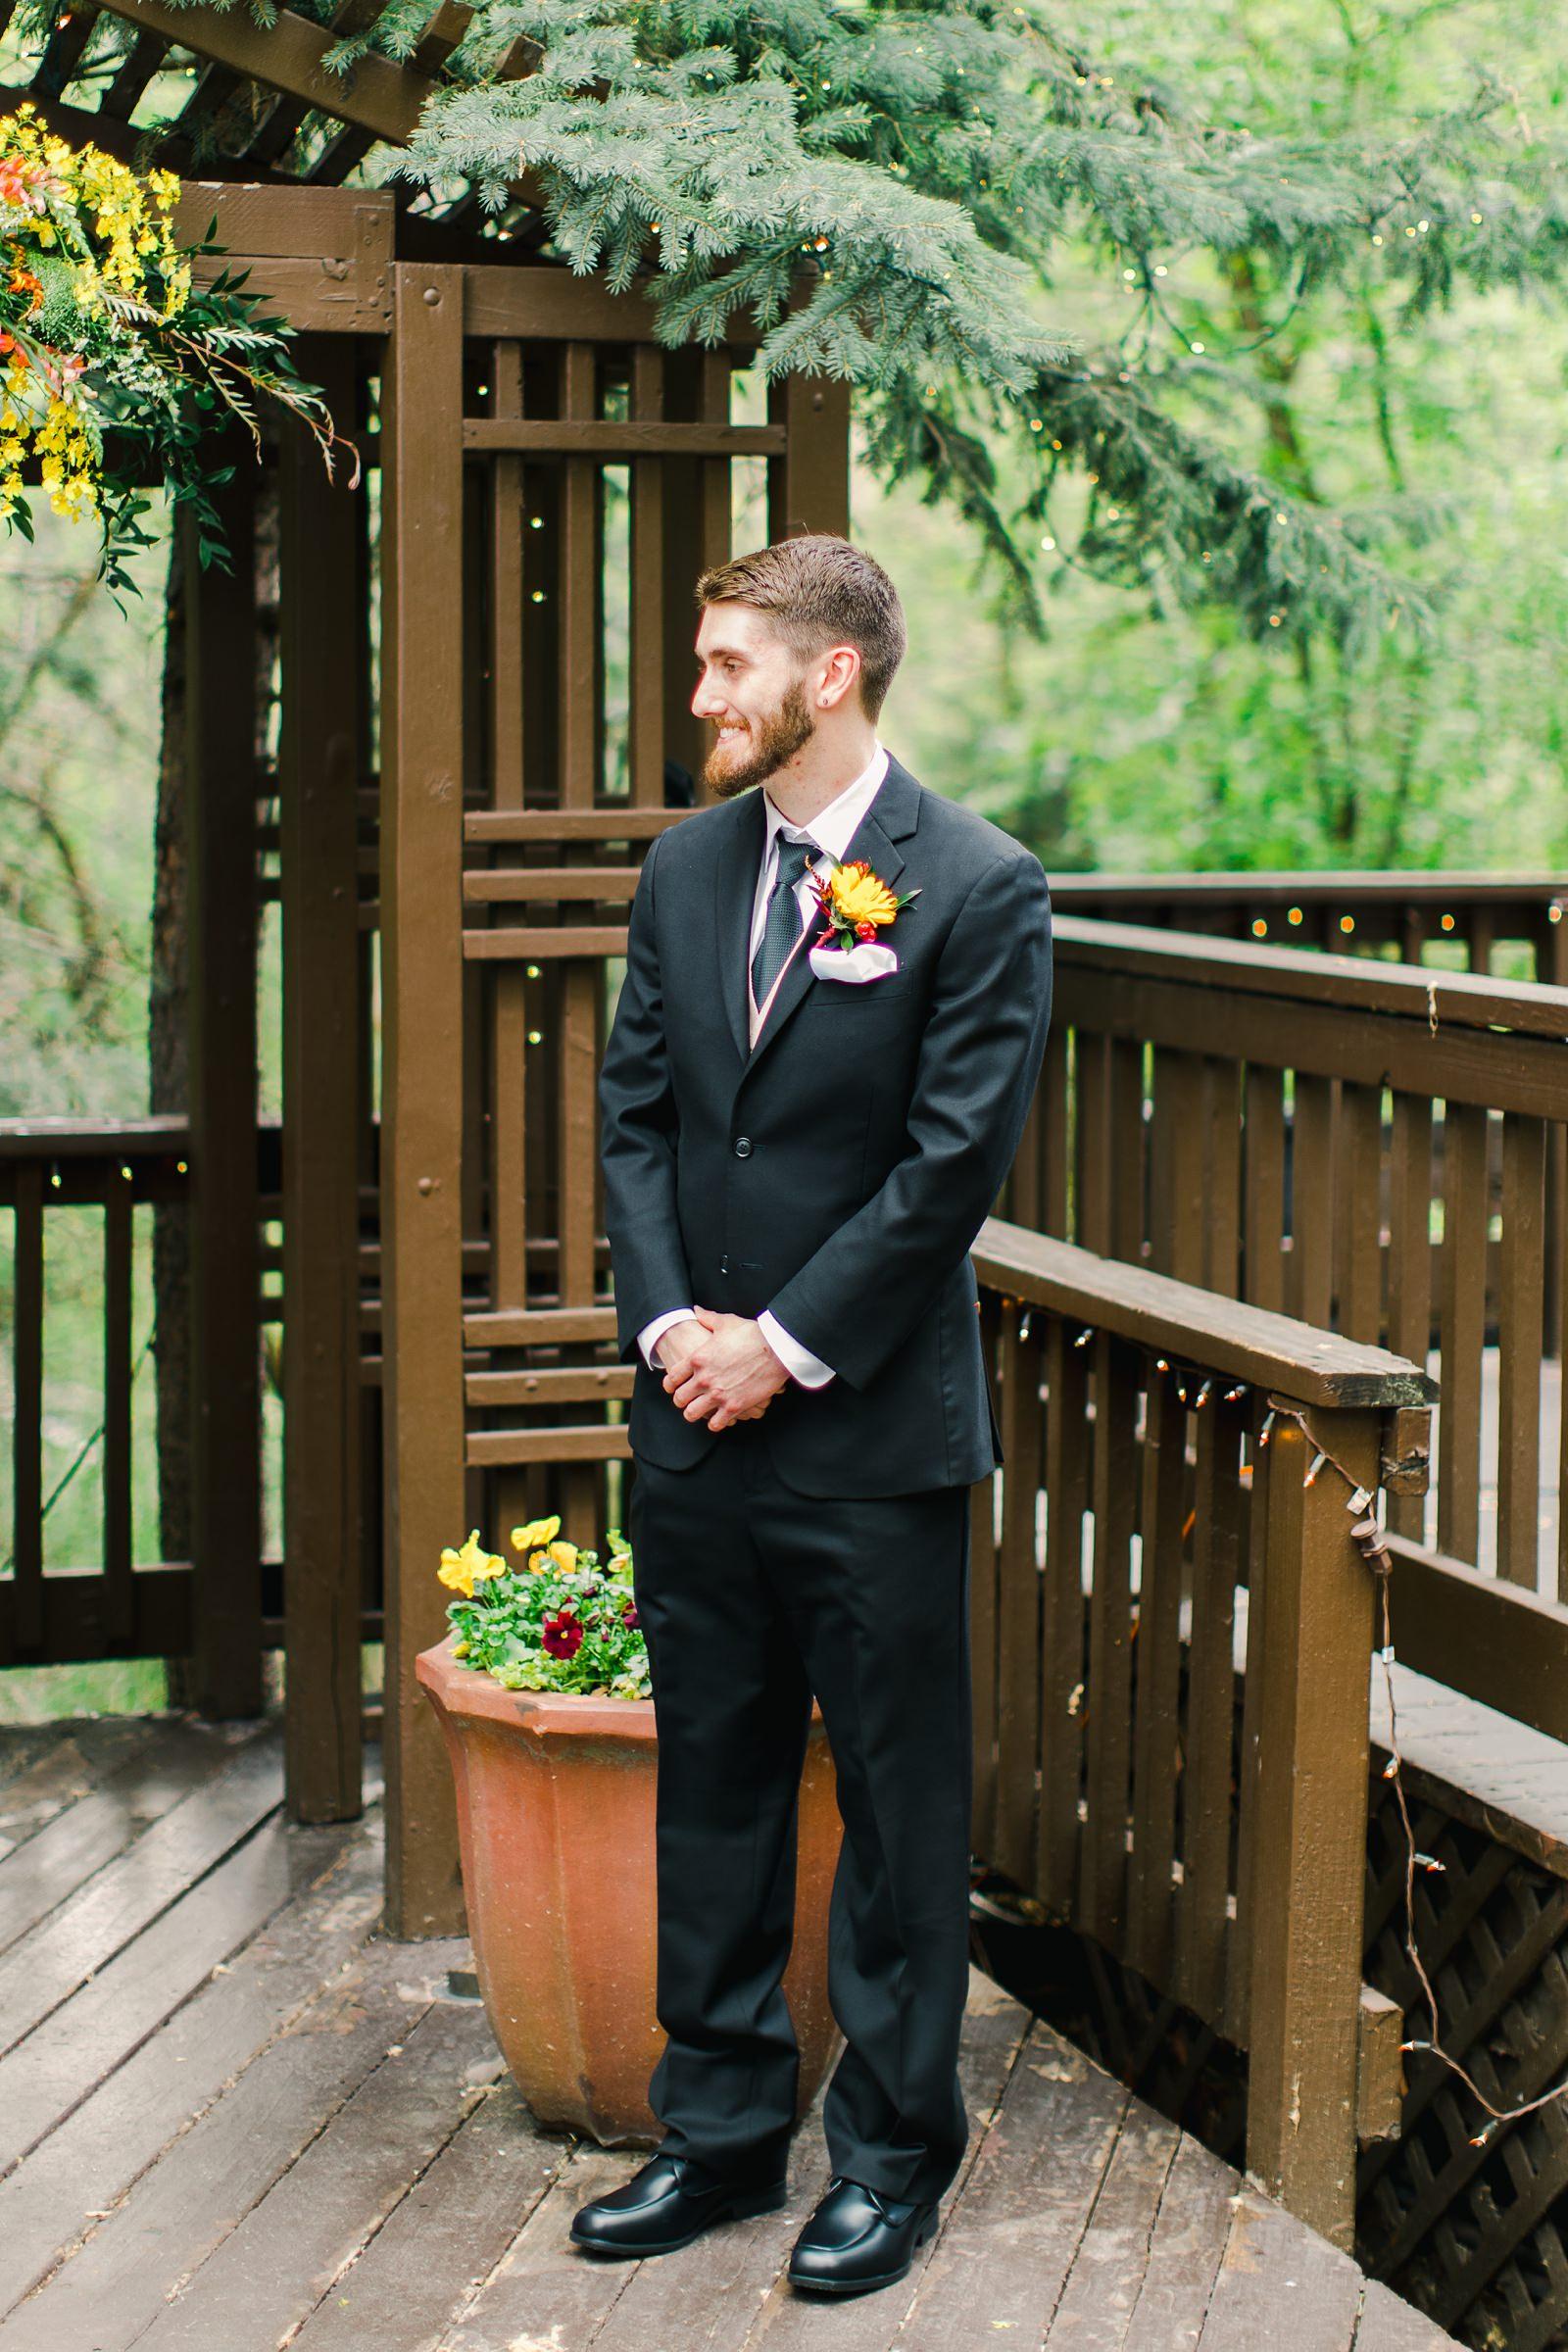 Millcreek Inn Summer Wedding, Utah wedding photography Millcreek Canyon, Salt Lake City, mountain ceremony, groomsmen classic black suit